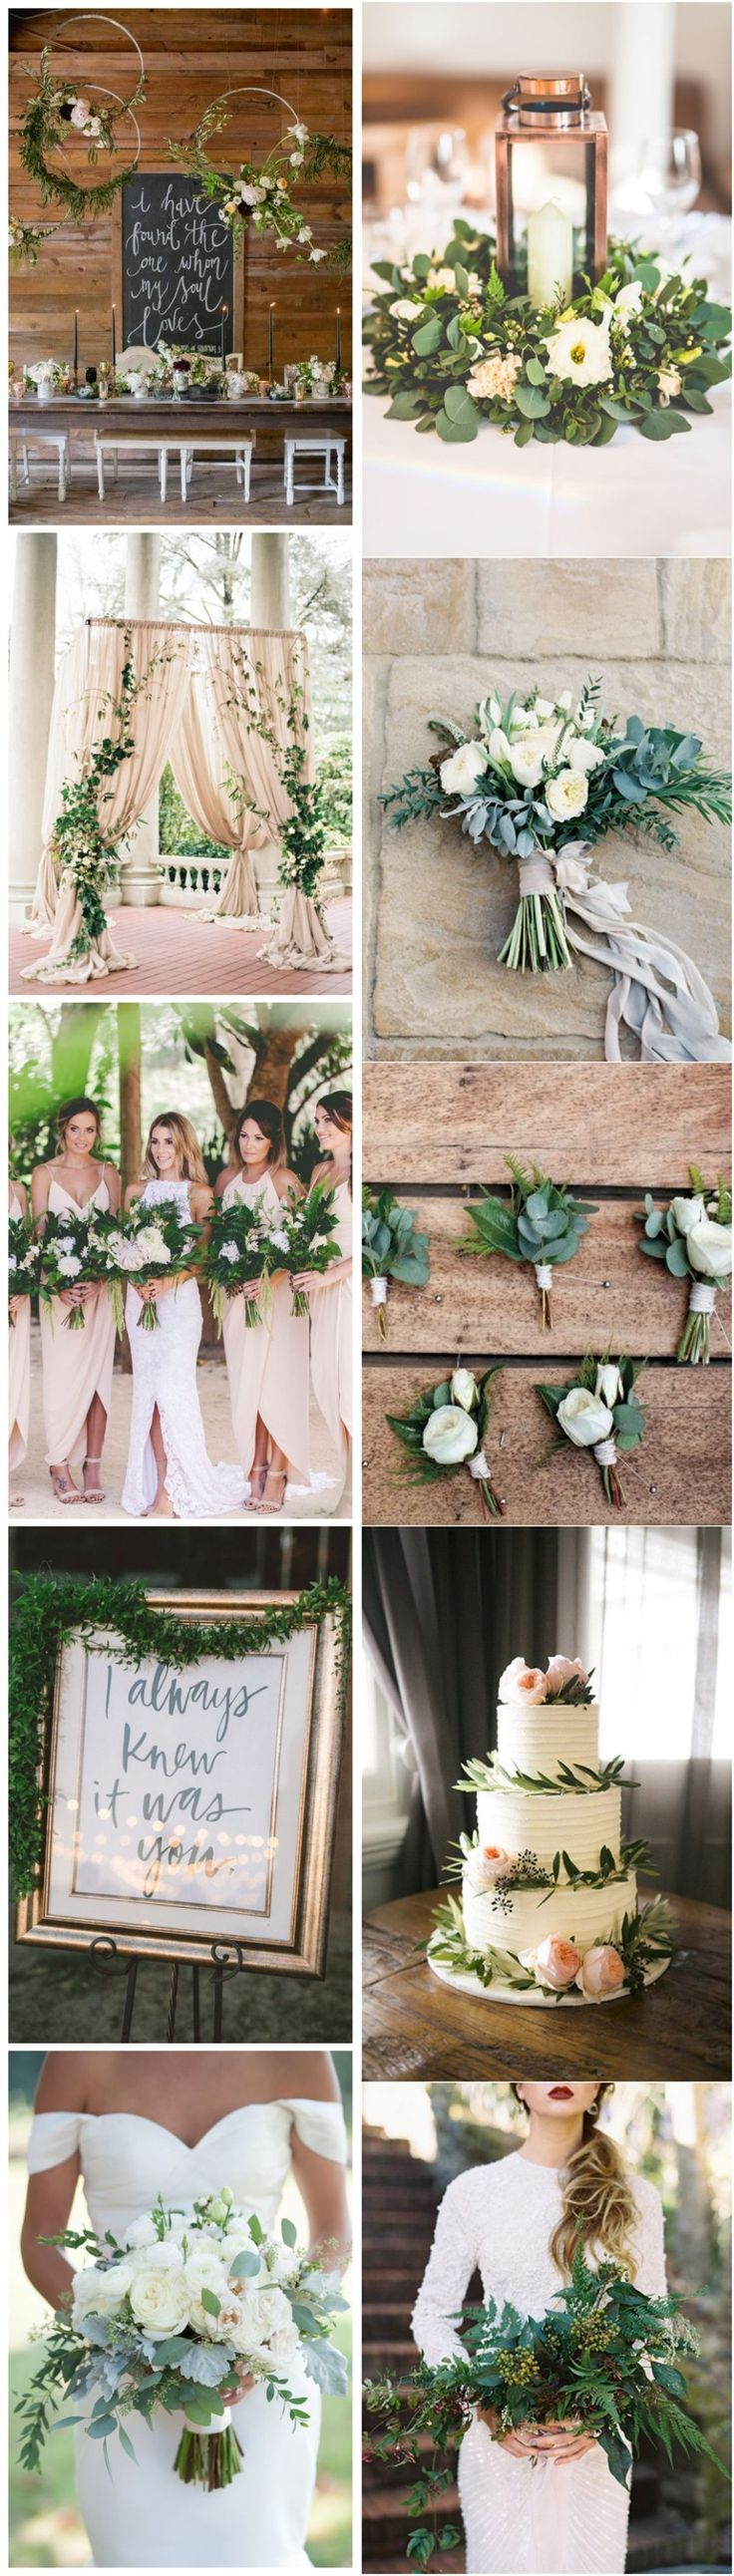 Greenery wedding color ideas 2017  #RePin by AT Social Media Marketing - Pinterest Marketing Specialists ATSocialMedia.co.uk